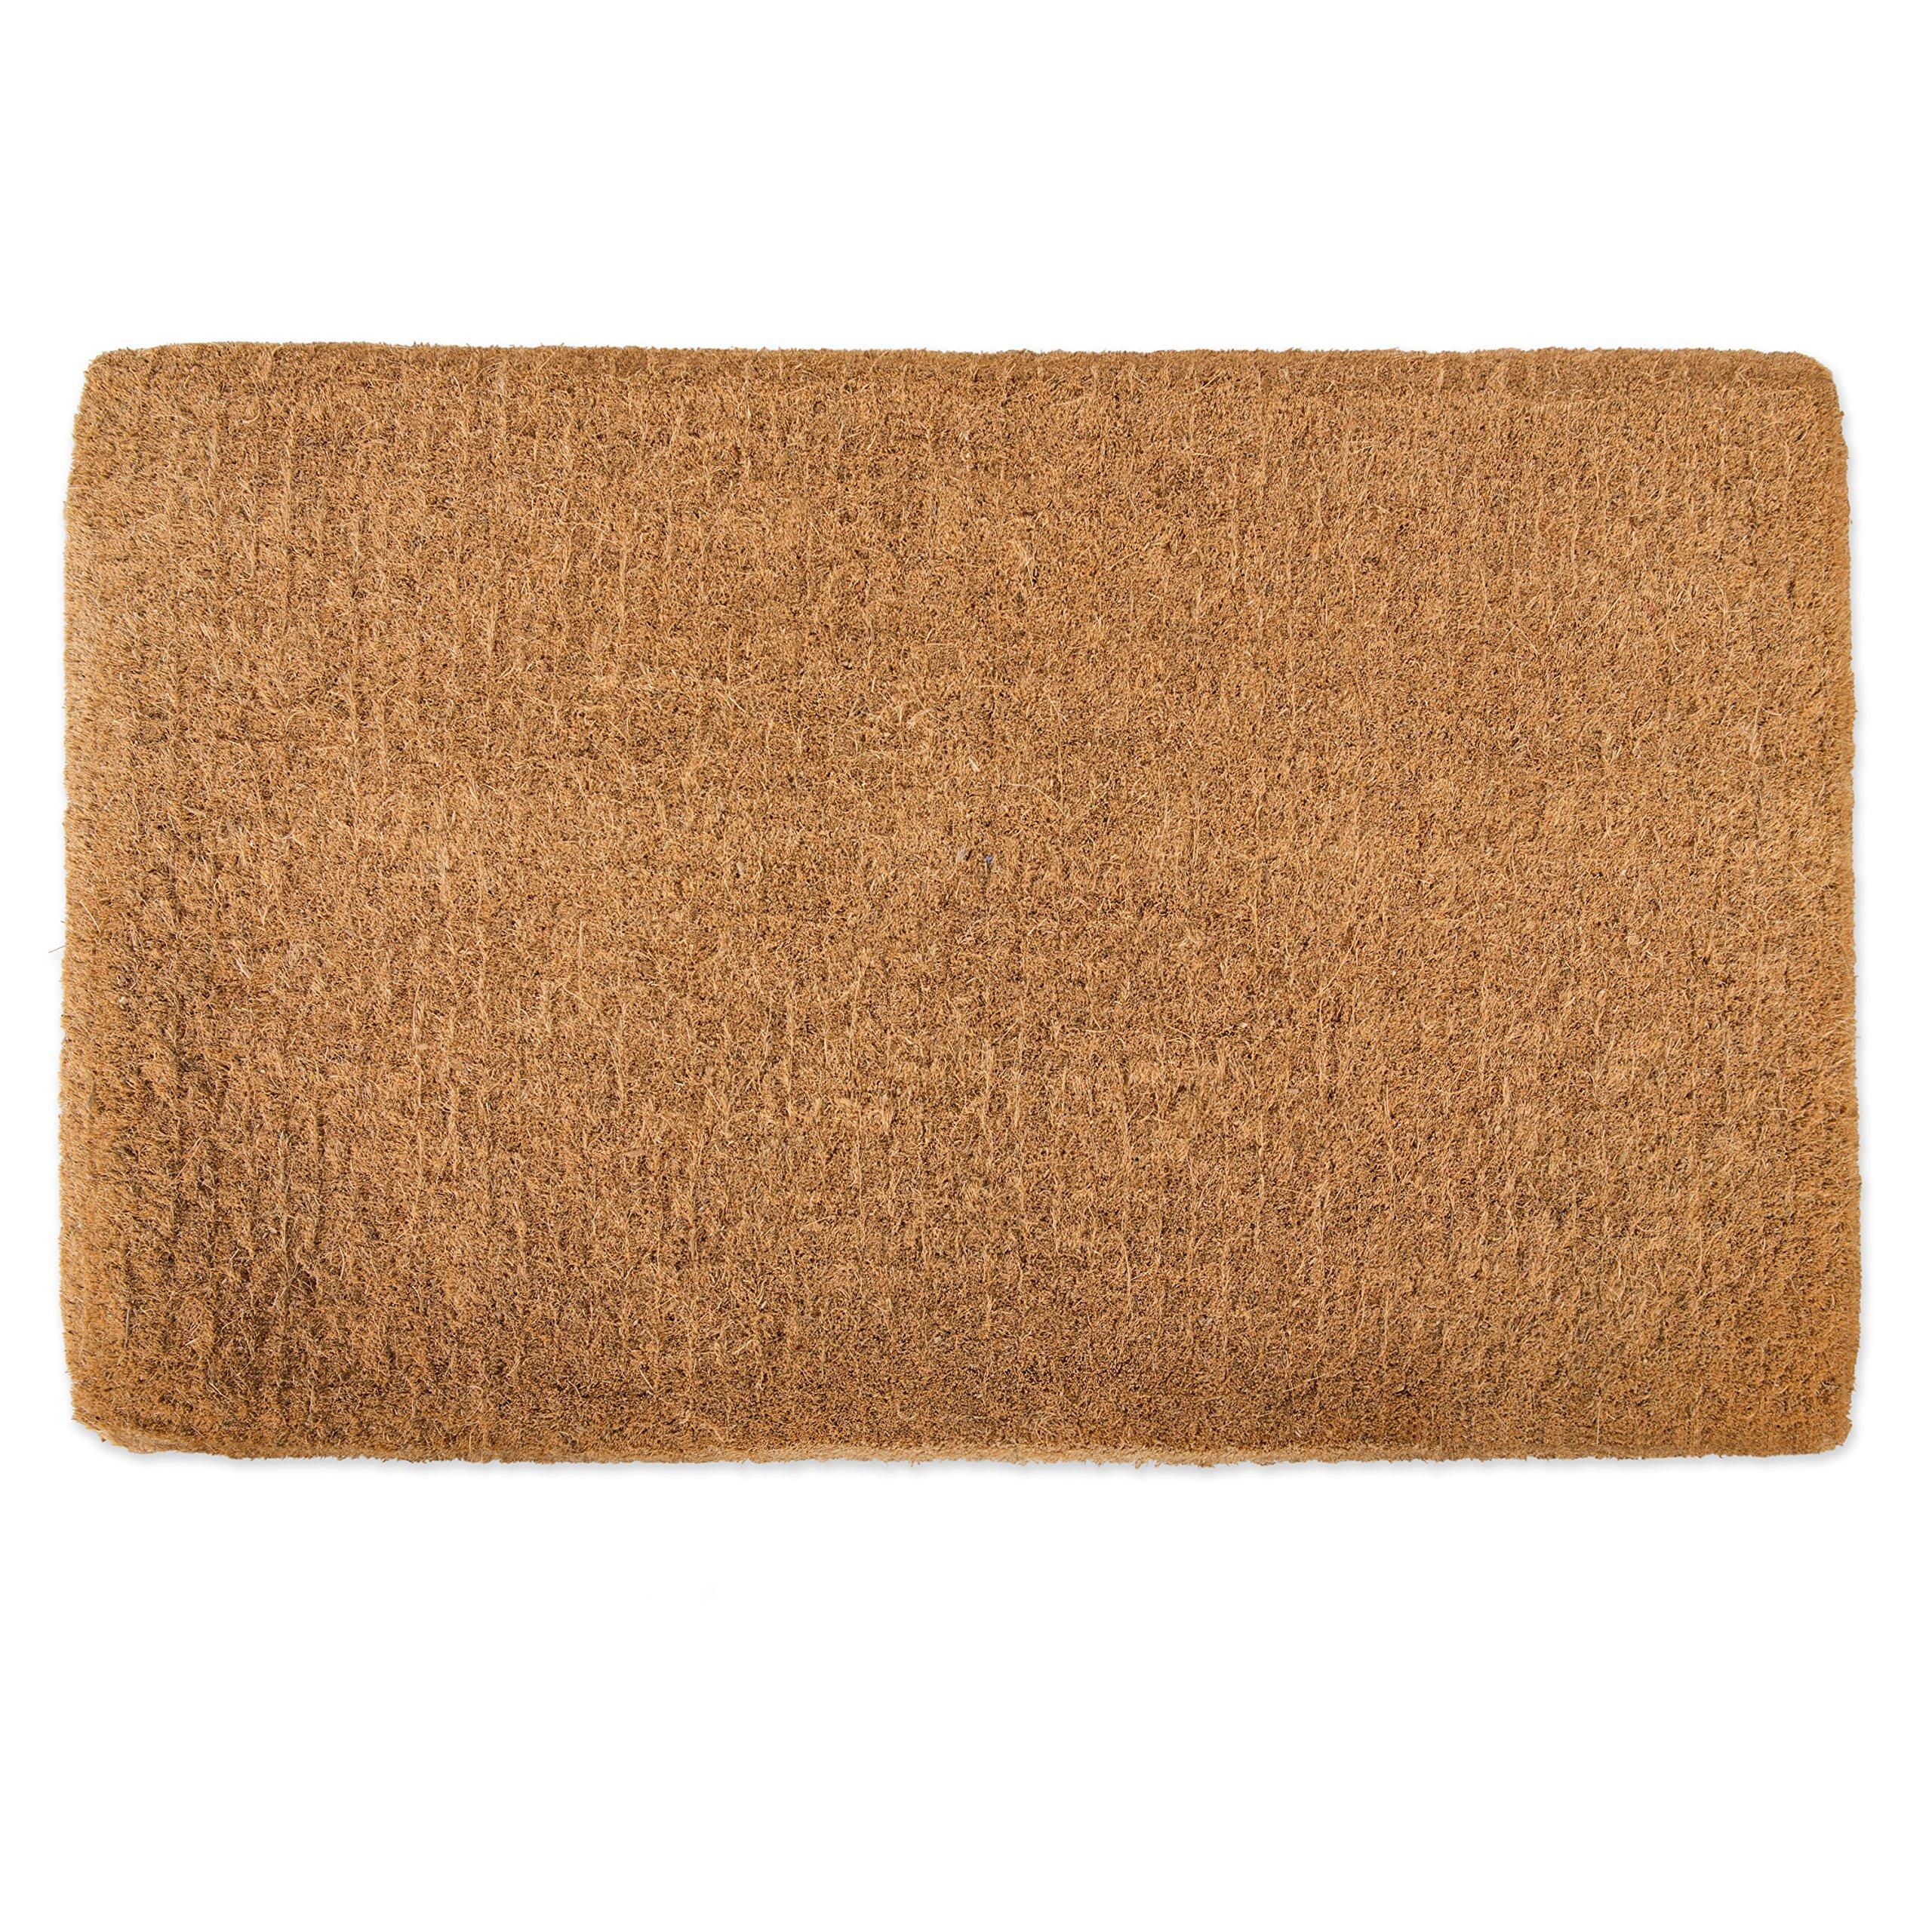 Natural Coir Coco Fiber Imperial Outdoor Doormat, 30x48'', Heavy Duty Entry Way Shoes Scraper Patio Rug Dirt Debris Mud Trapper Waterproof-Plain by J&M Home Fashions